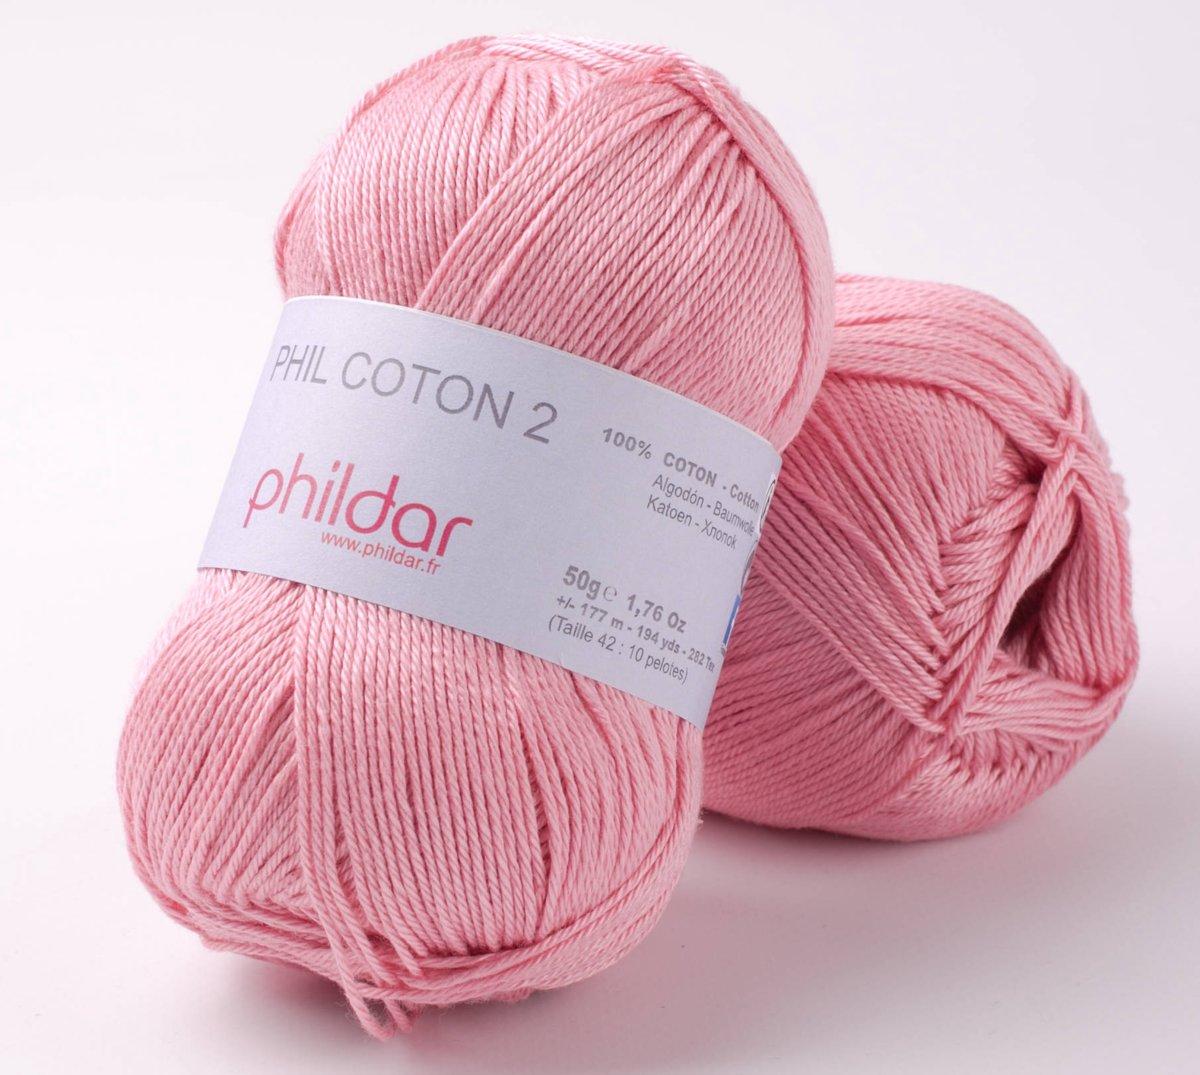 Phildar Phil Coton 2  meringue 10 x 50 gram kopen